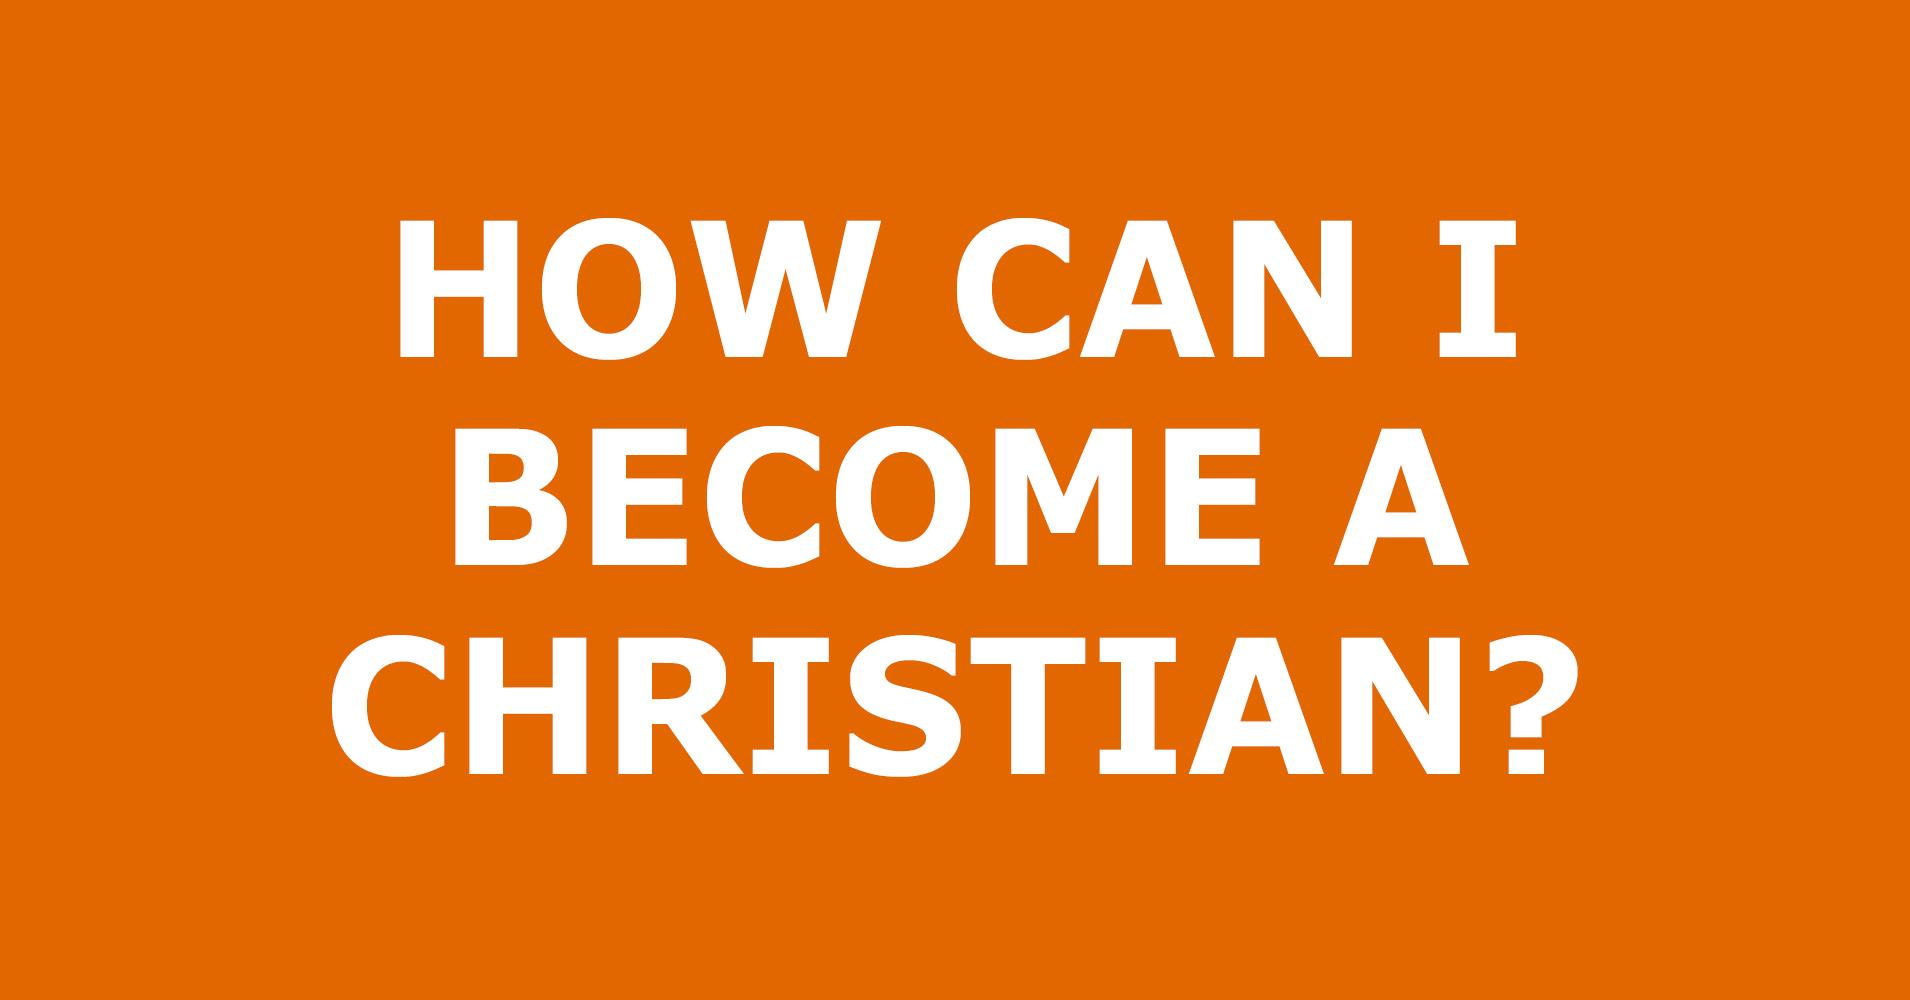 Become-A-Christian.jpg